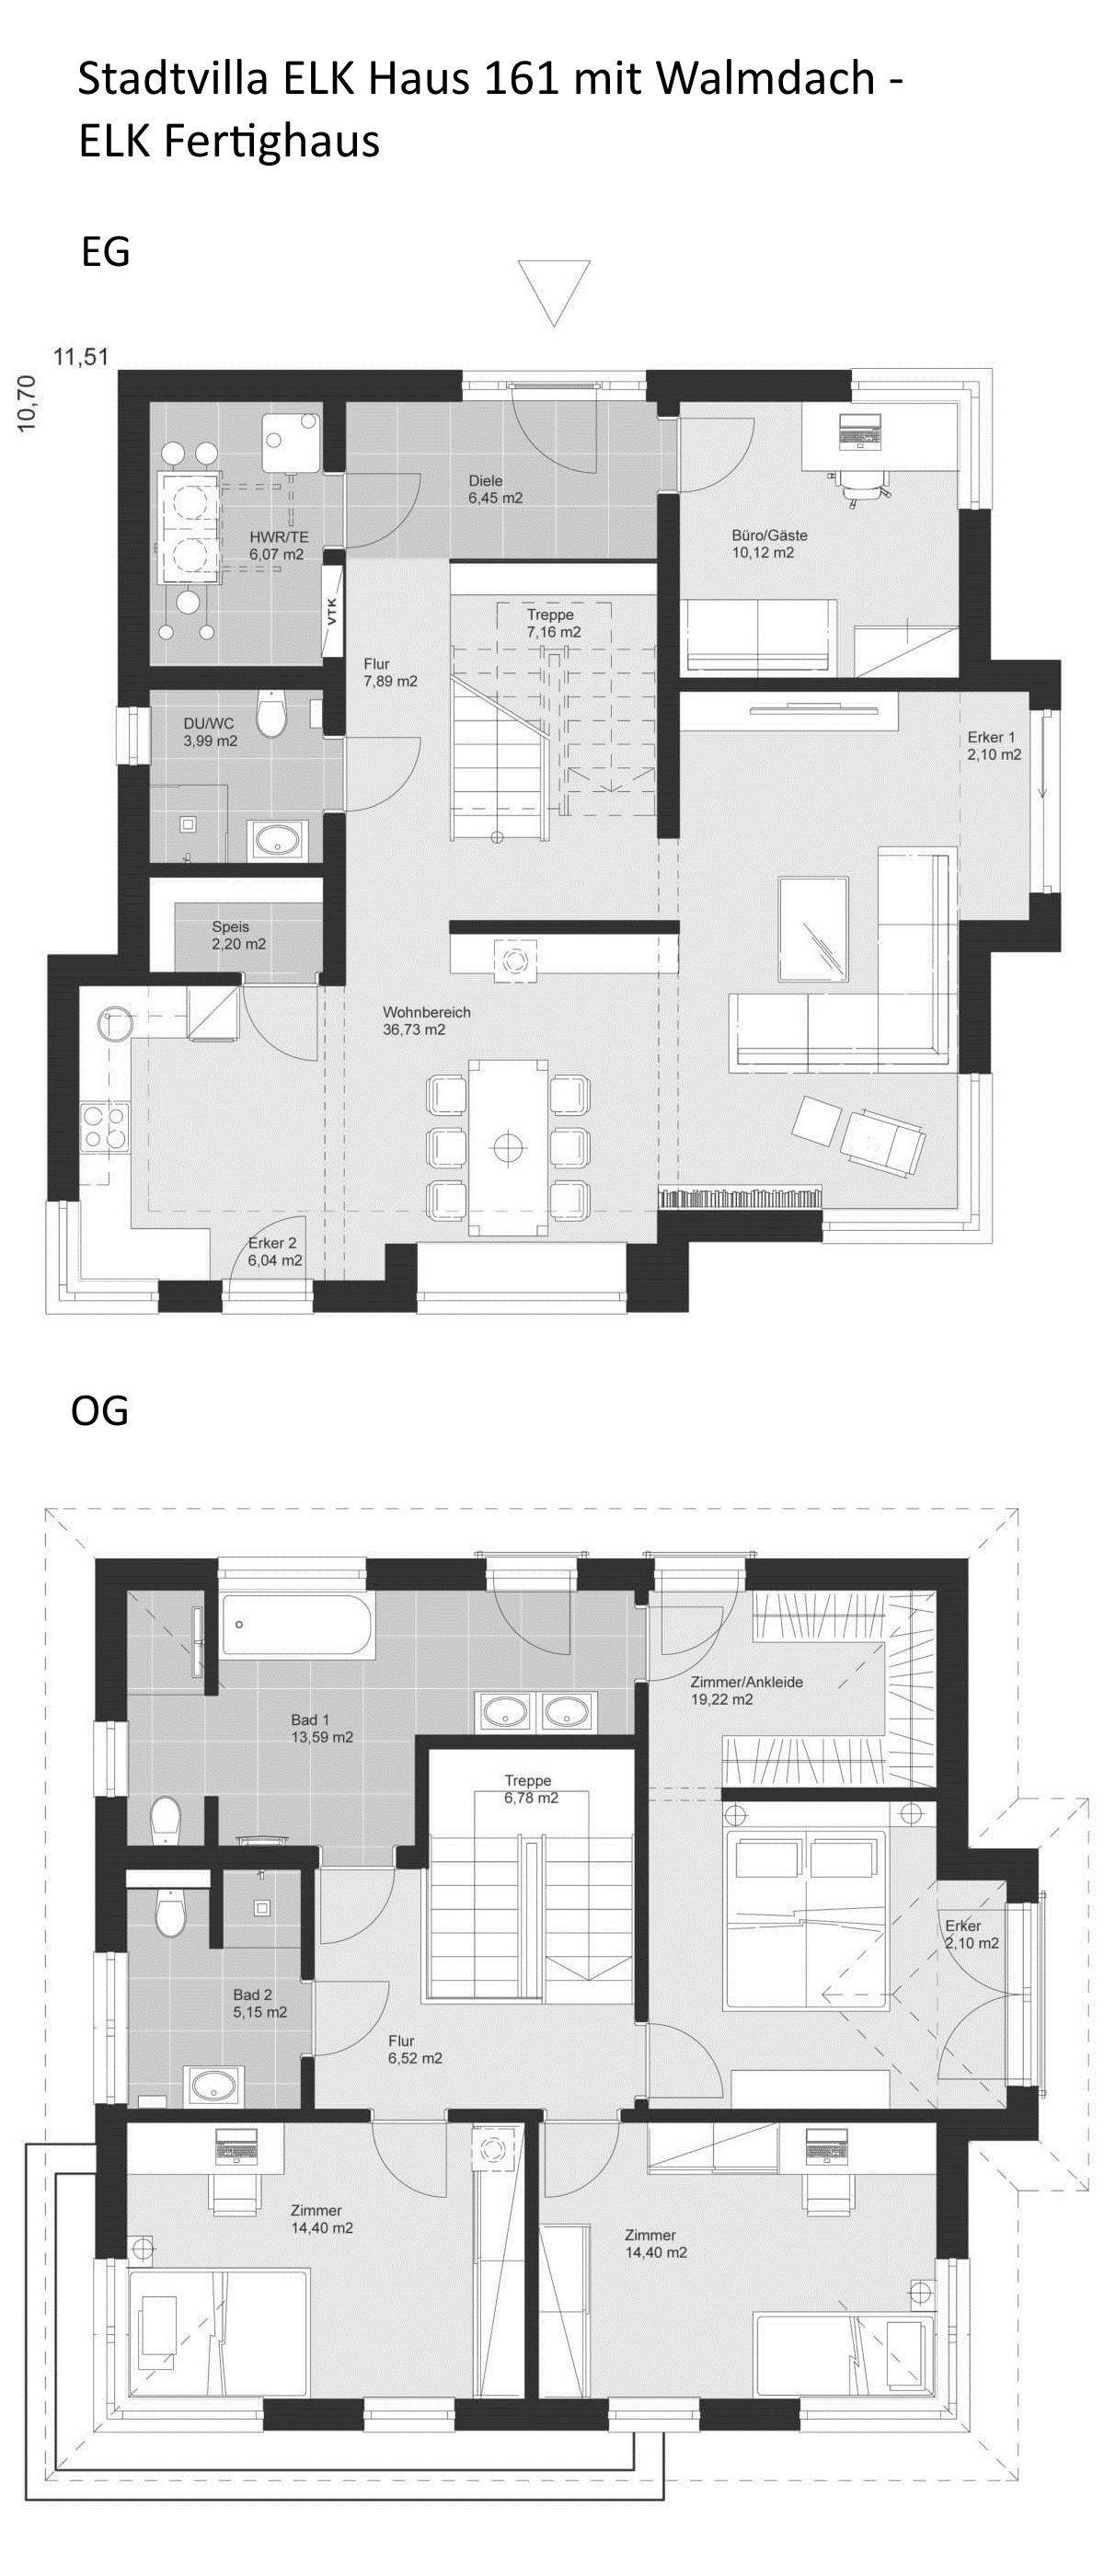 Fertighaus Stadtvilla modern ELK Haus 161 ELK Fertighaus